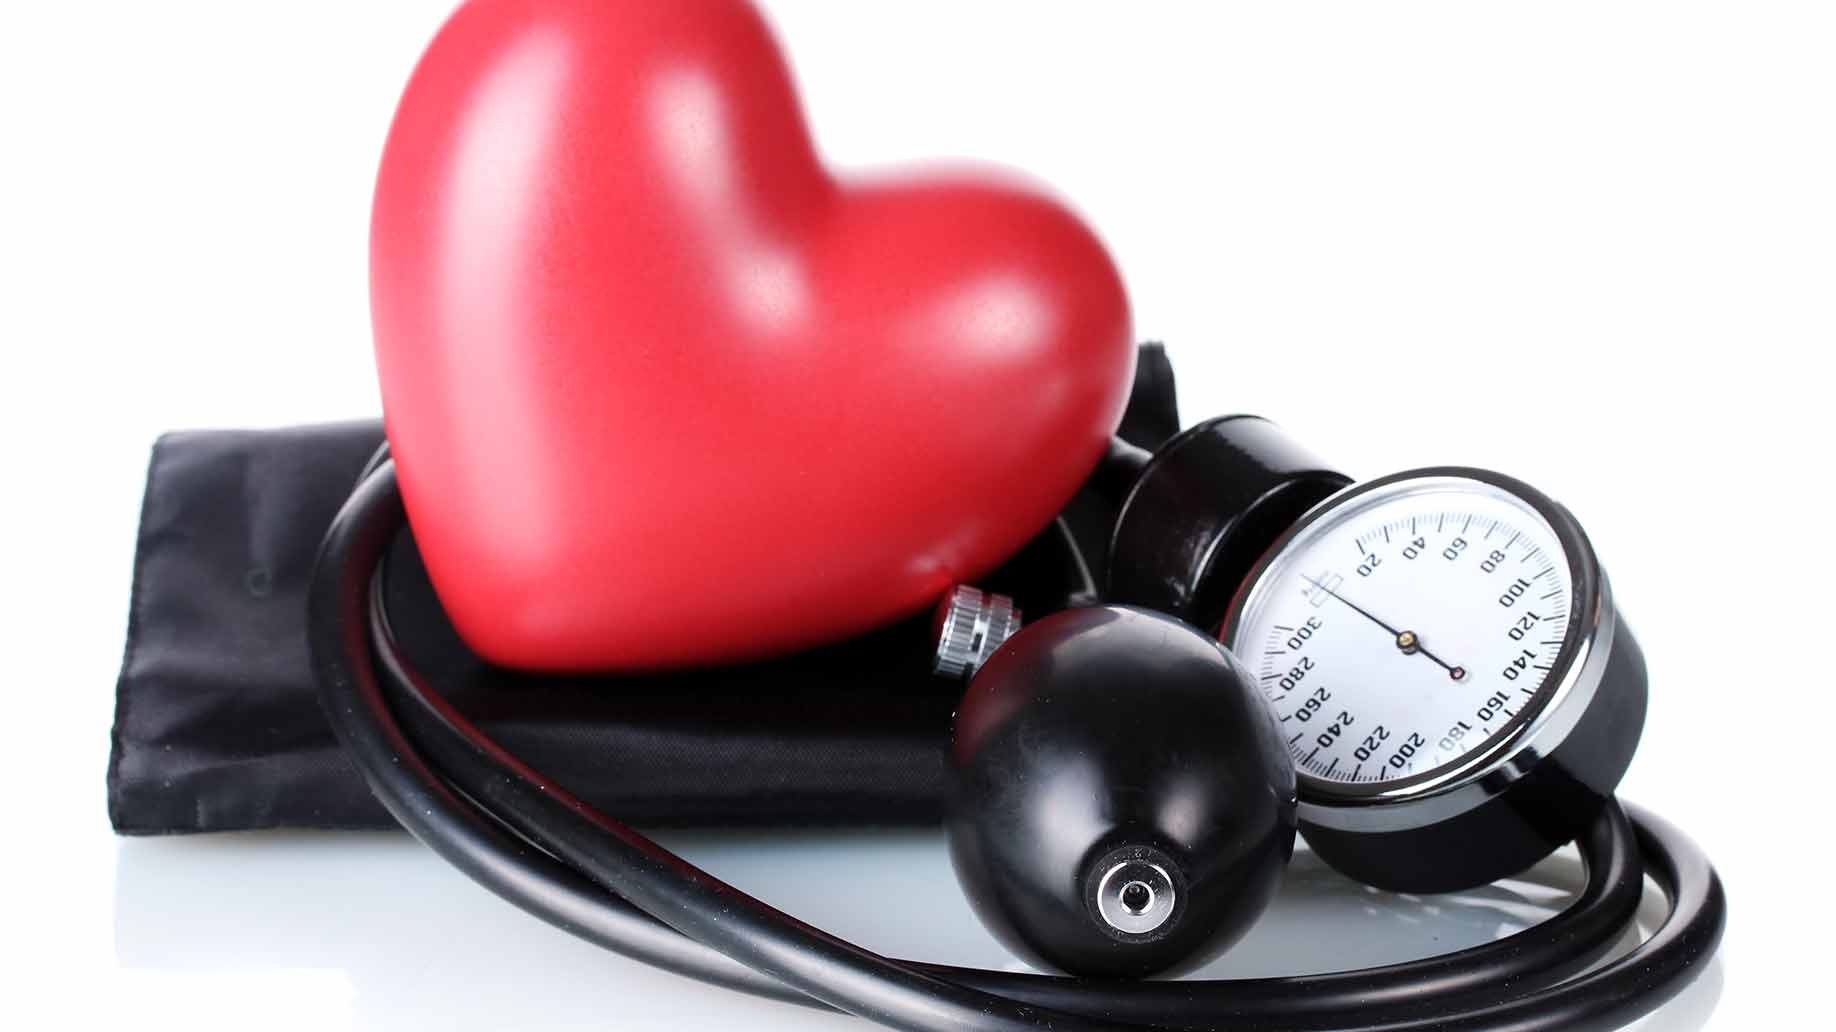 dark chocolate benefits blood pressure kidneys cholesterol health antioxidants